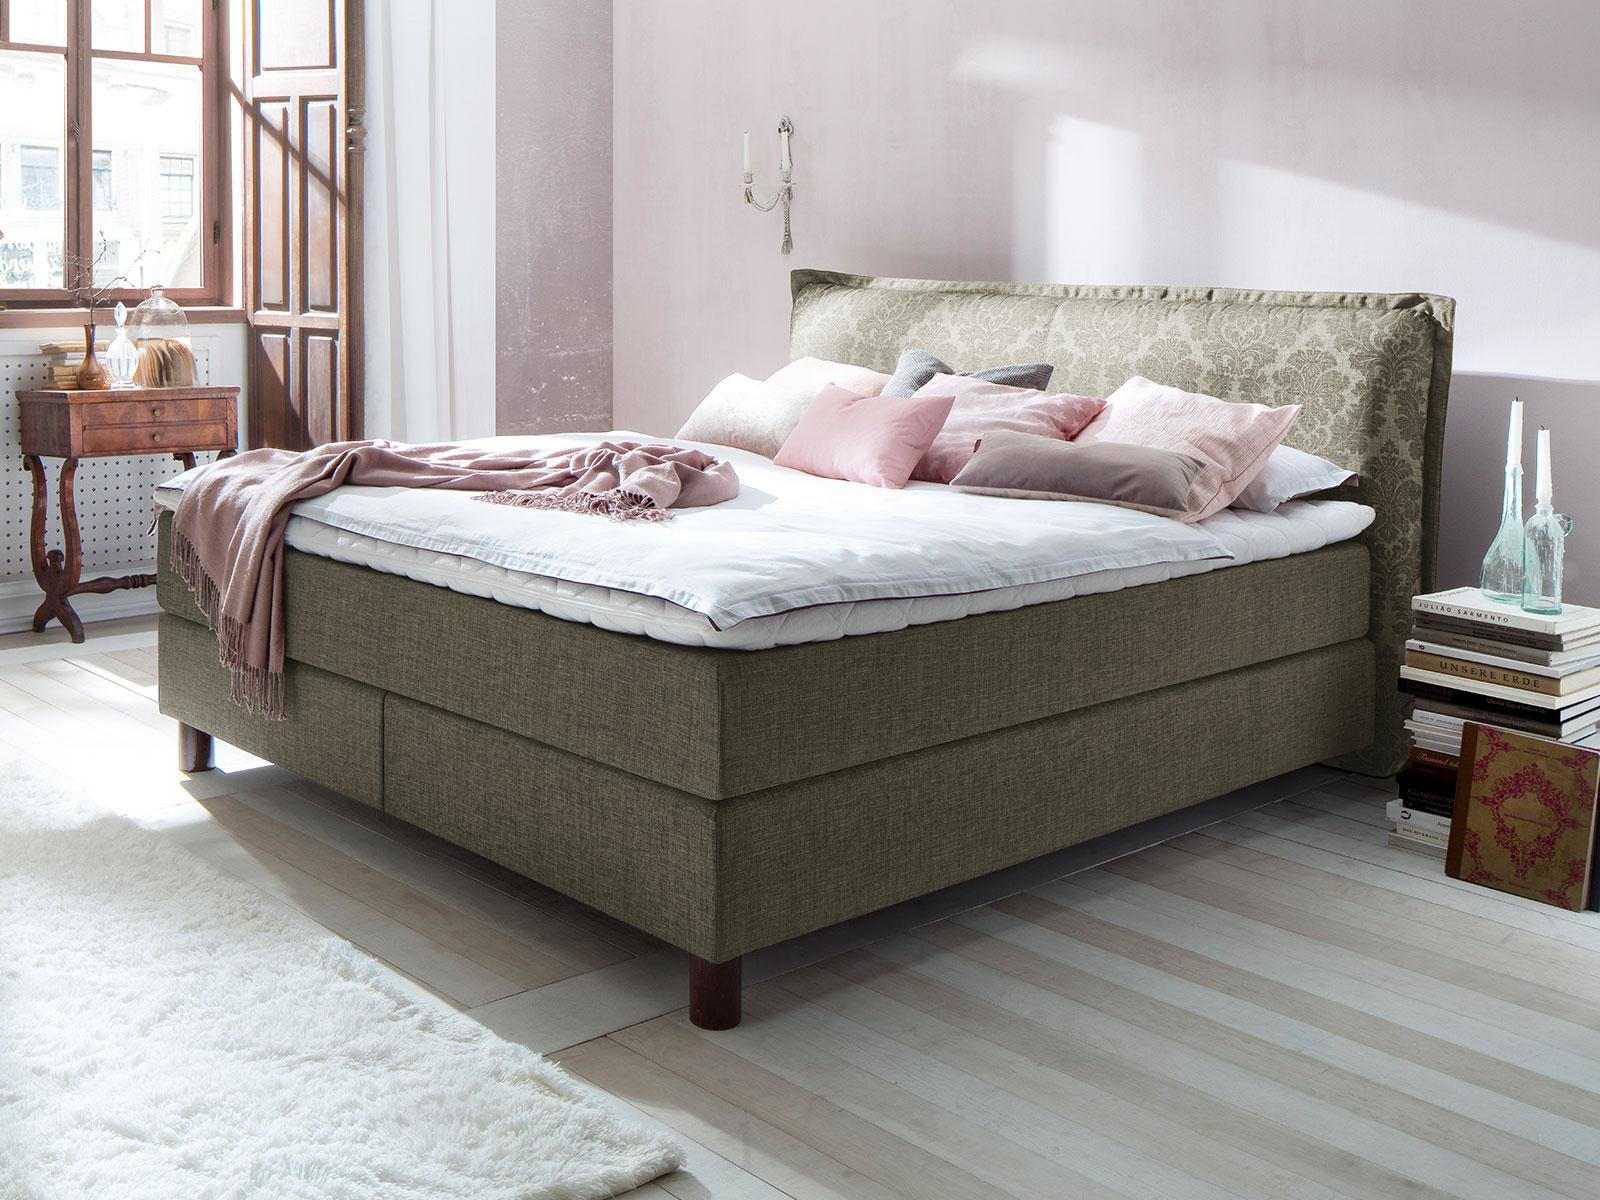 bett im landhausstil boxspring bett 28 images. Black Bedroom Furniture Sets. Home Design Ideas